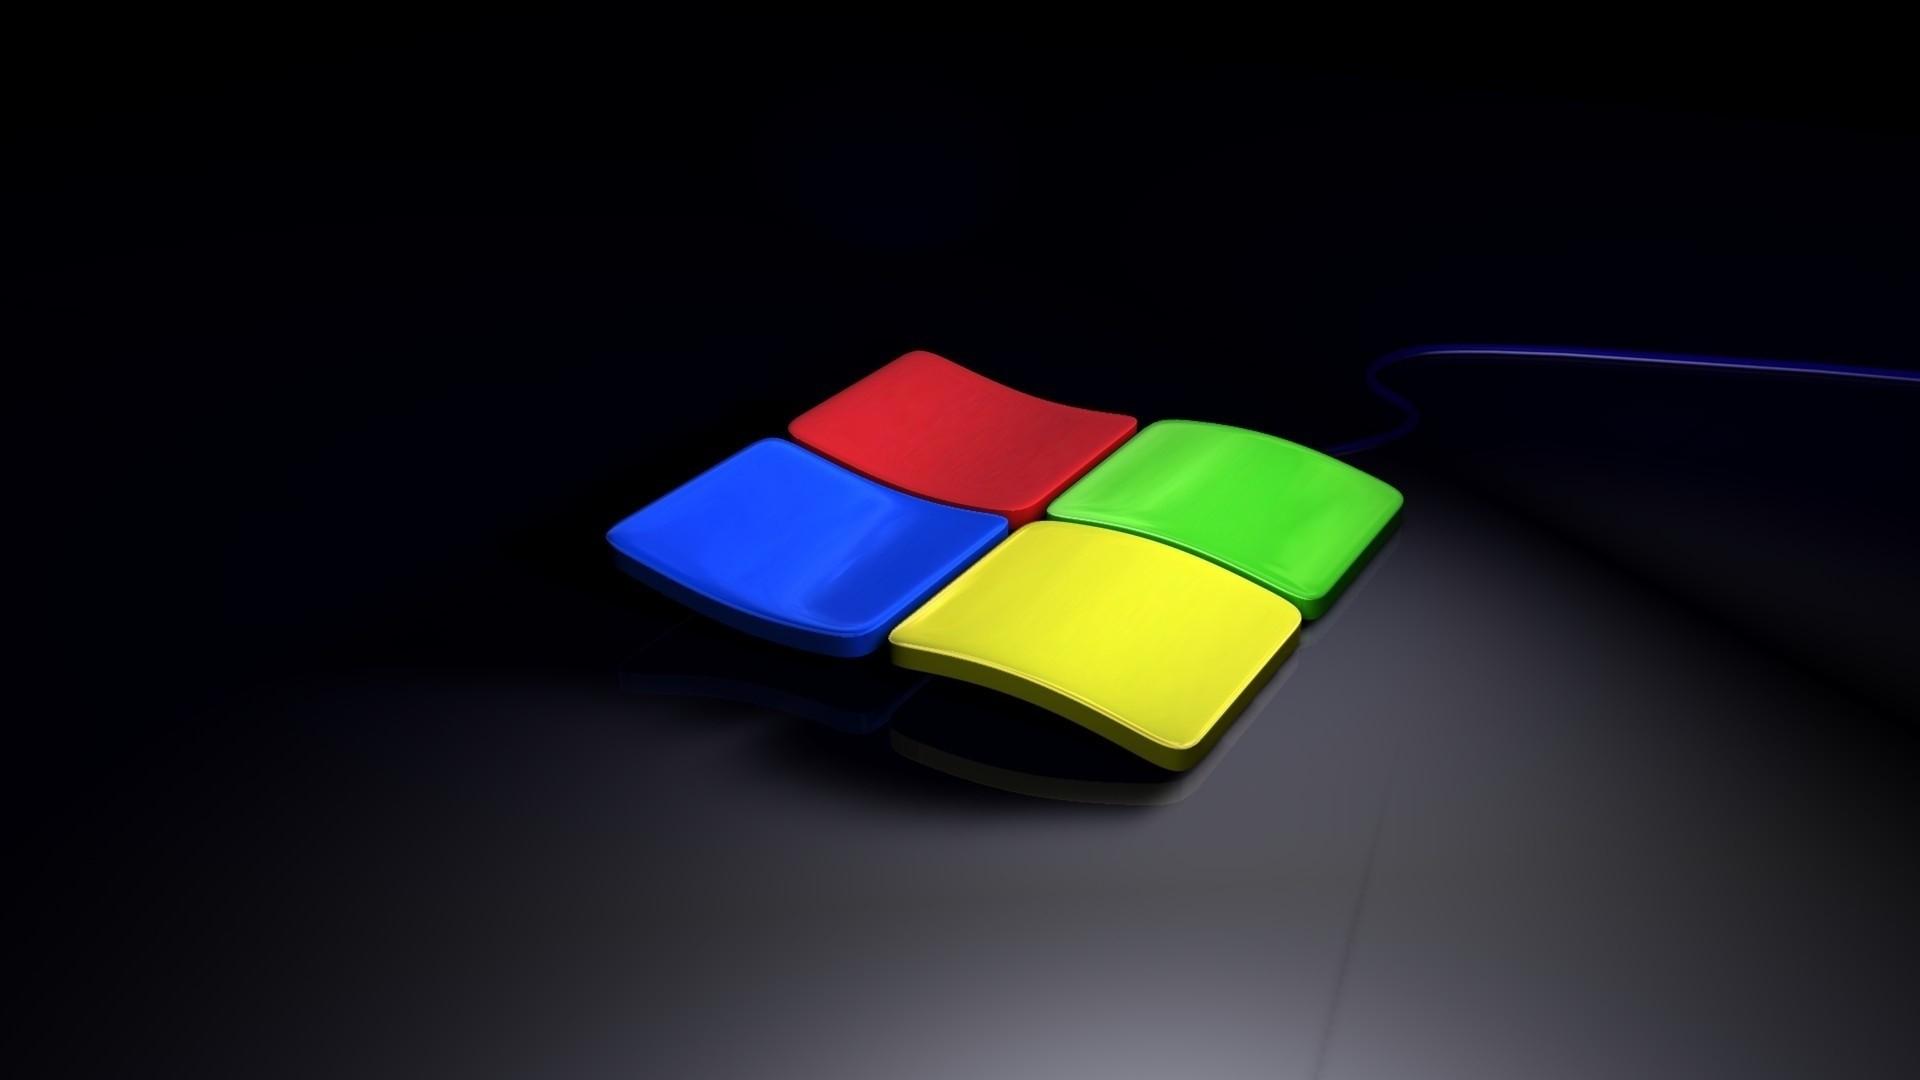 windows, black background, screen saver